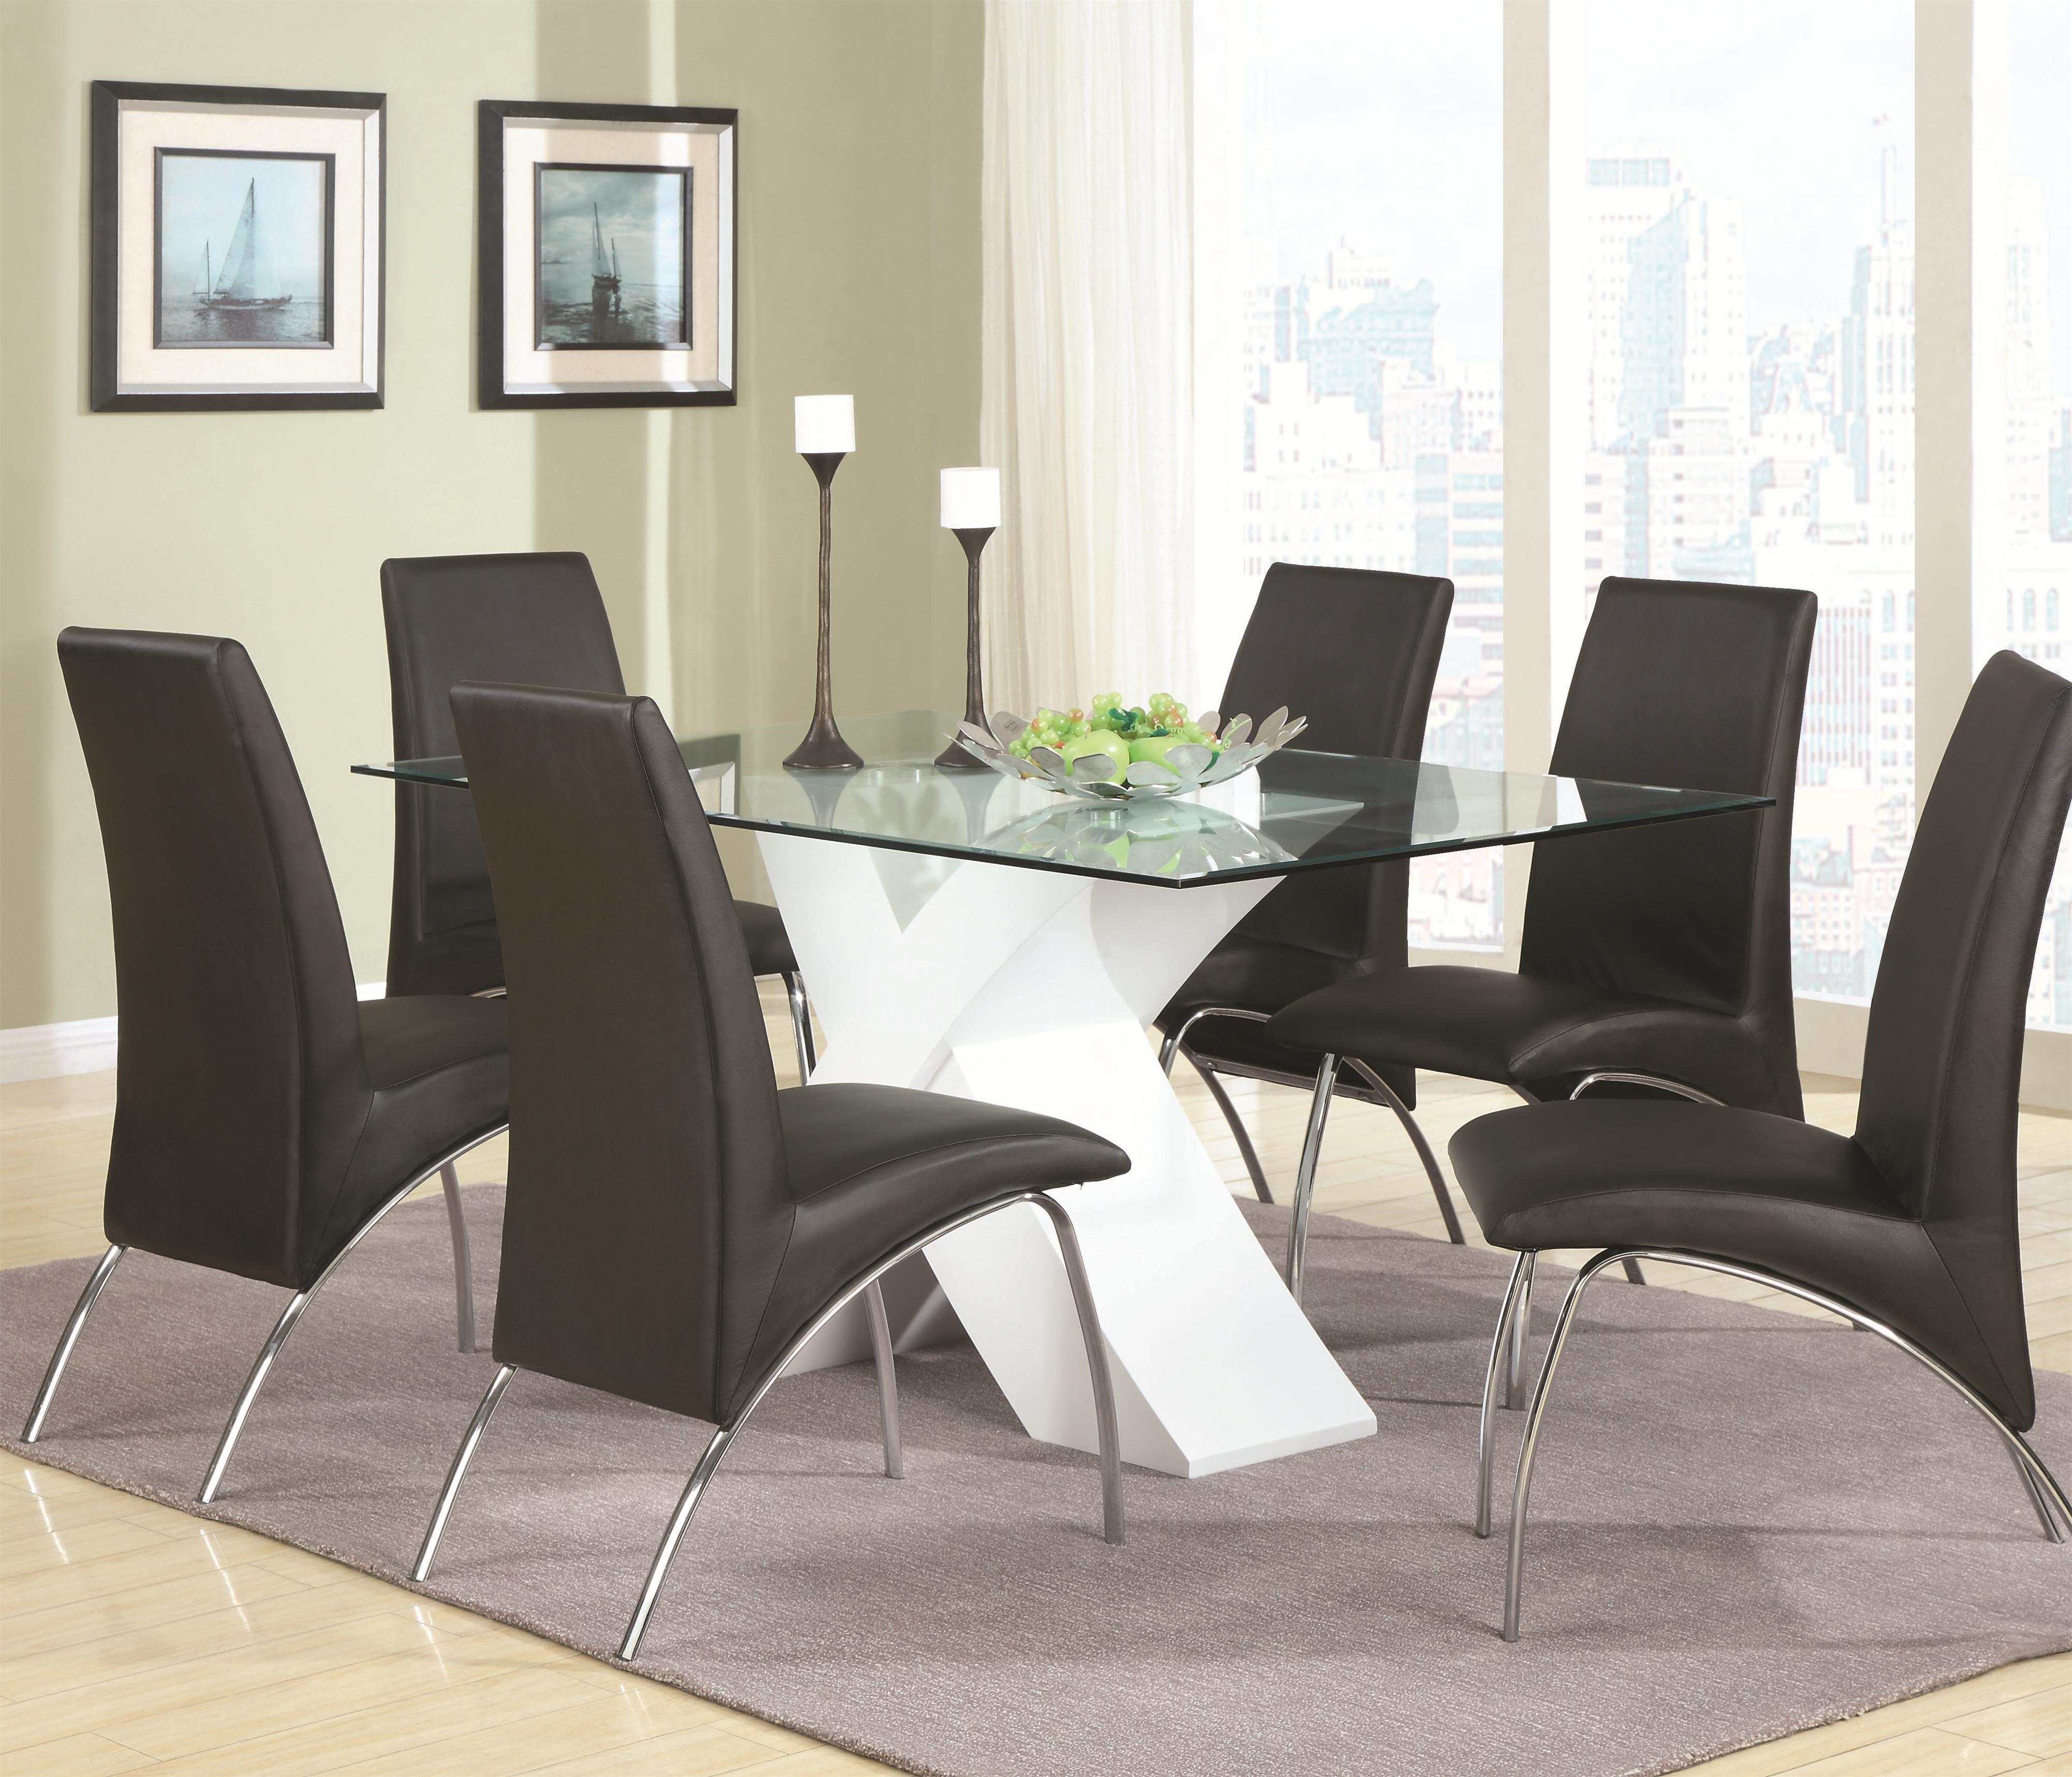 Coaster Ophelia Dining Set  - Item Number: 120821+6x02